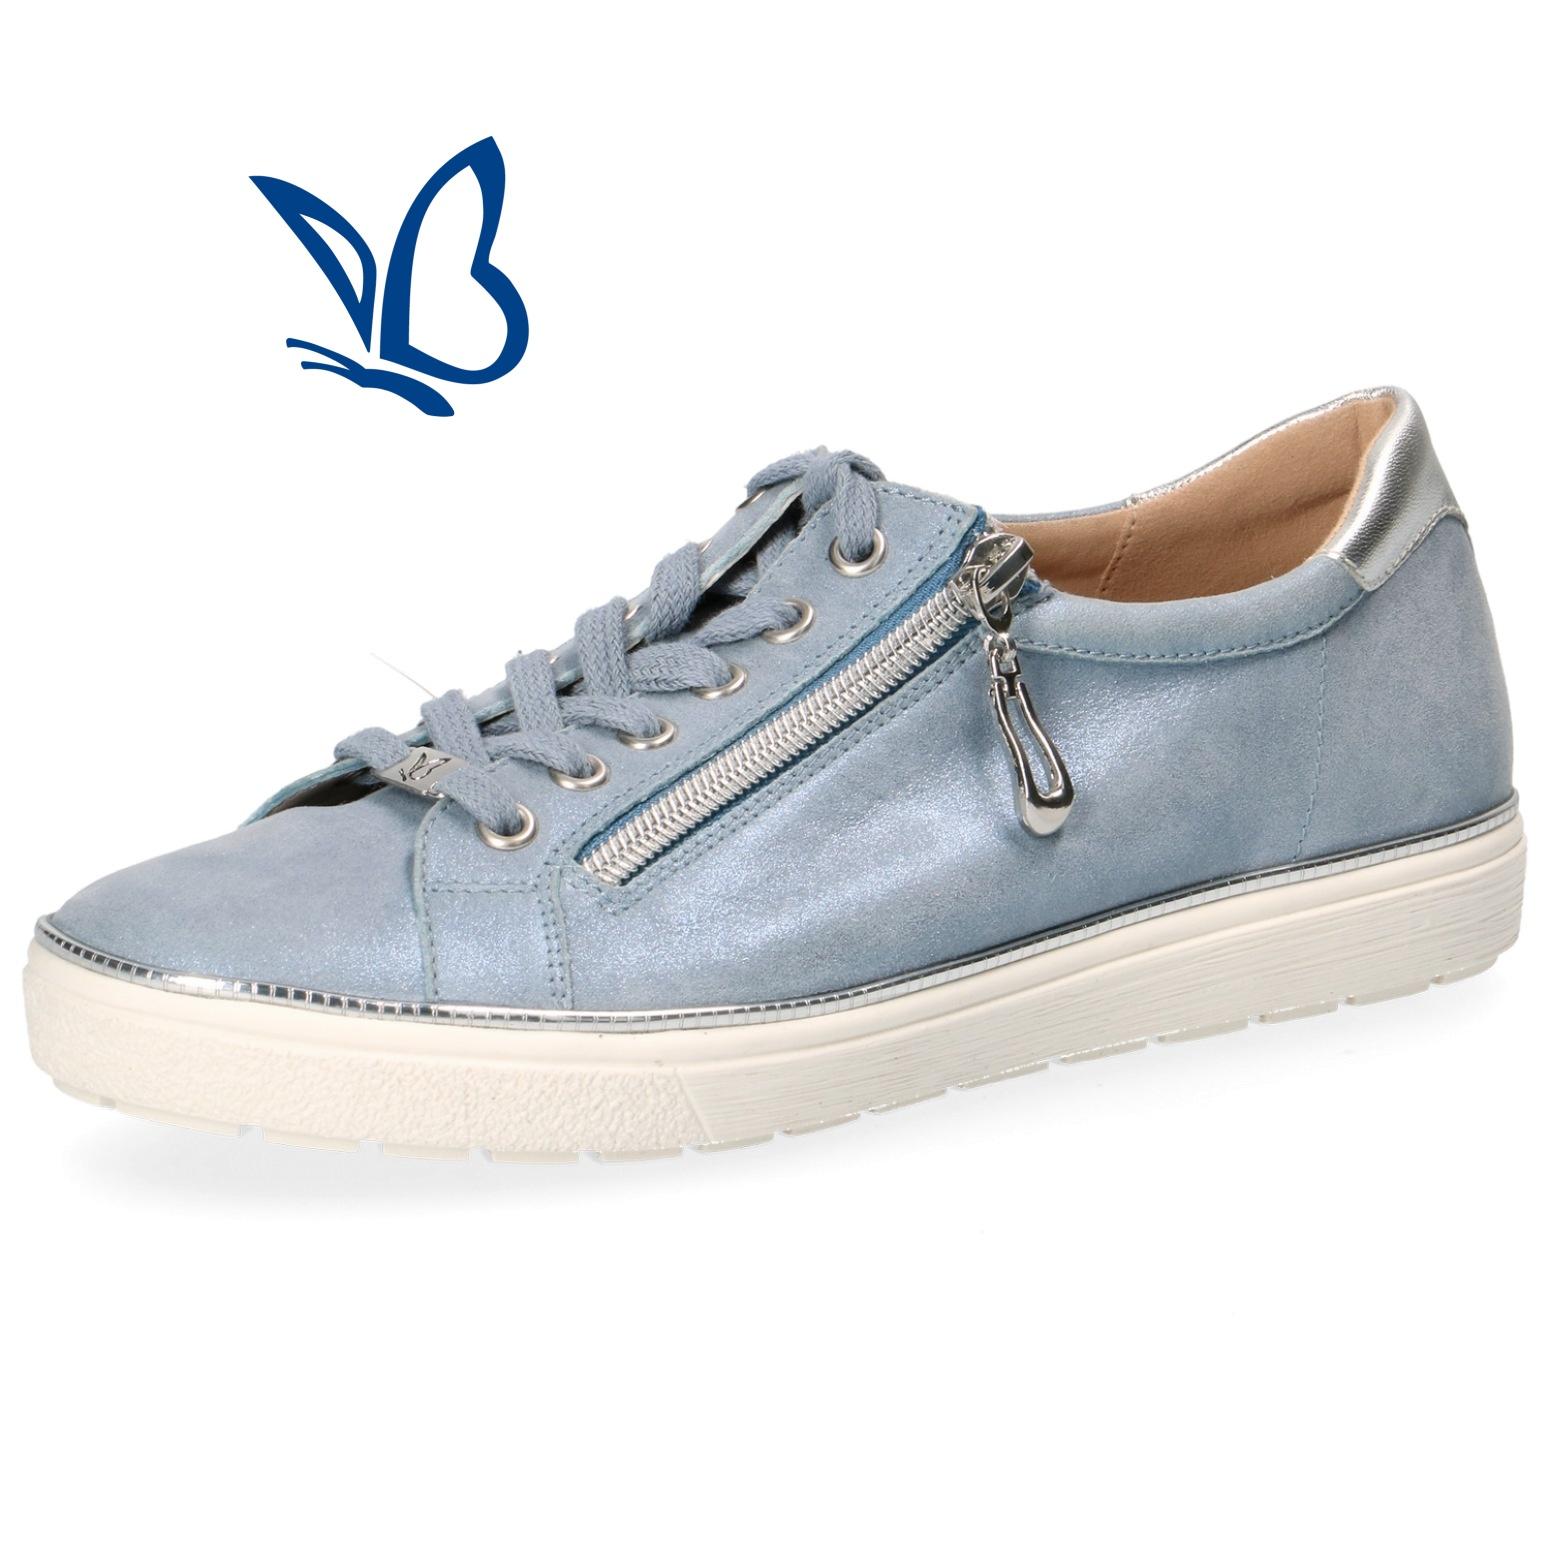 13d6766b26df Dámska vychádzková obuv CAPRICE 9-23606-22 861 BLUE SUE.MET. – Topánky  Olympia shoes